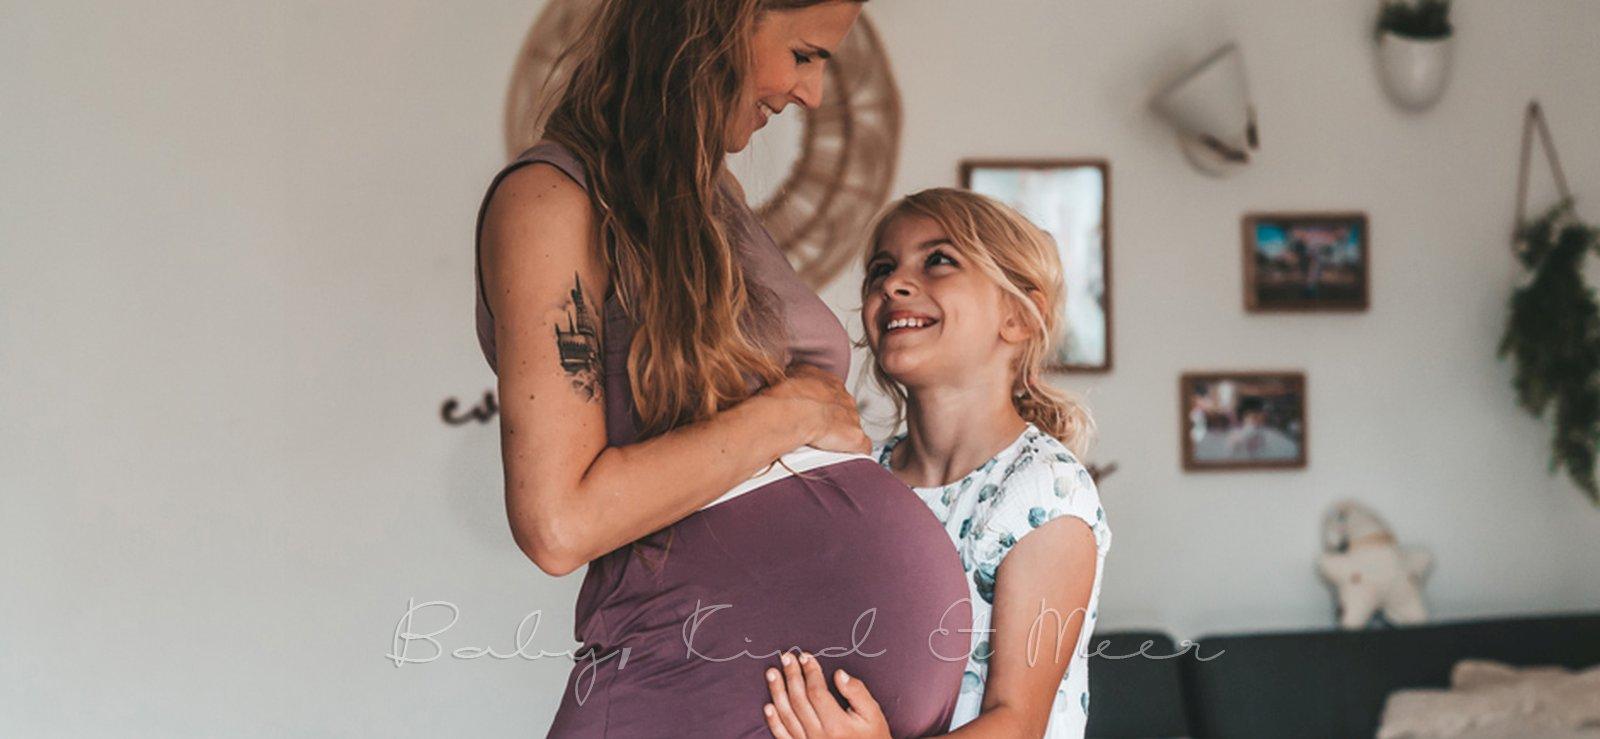 erinnerungen an die Schwangerschaft 21